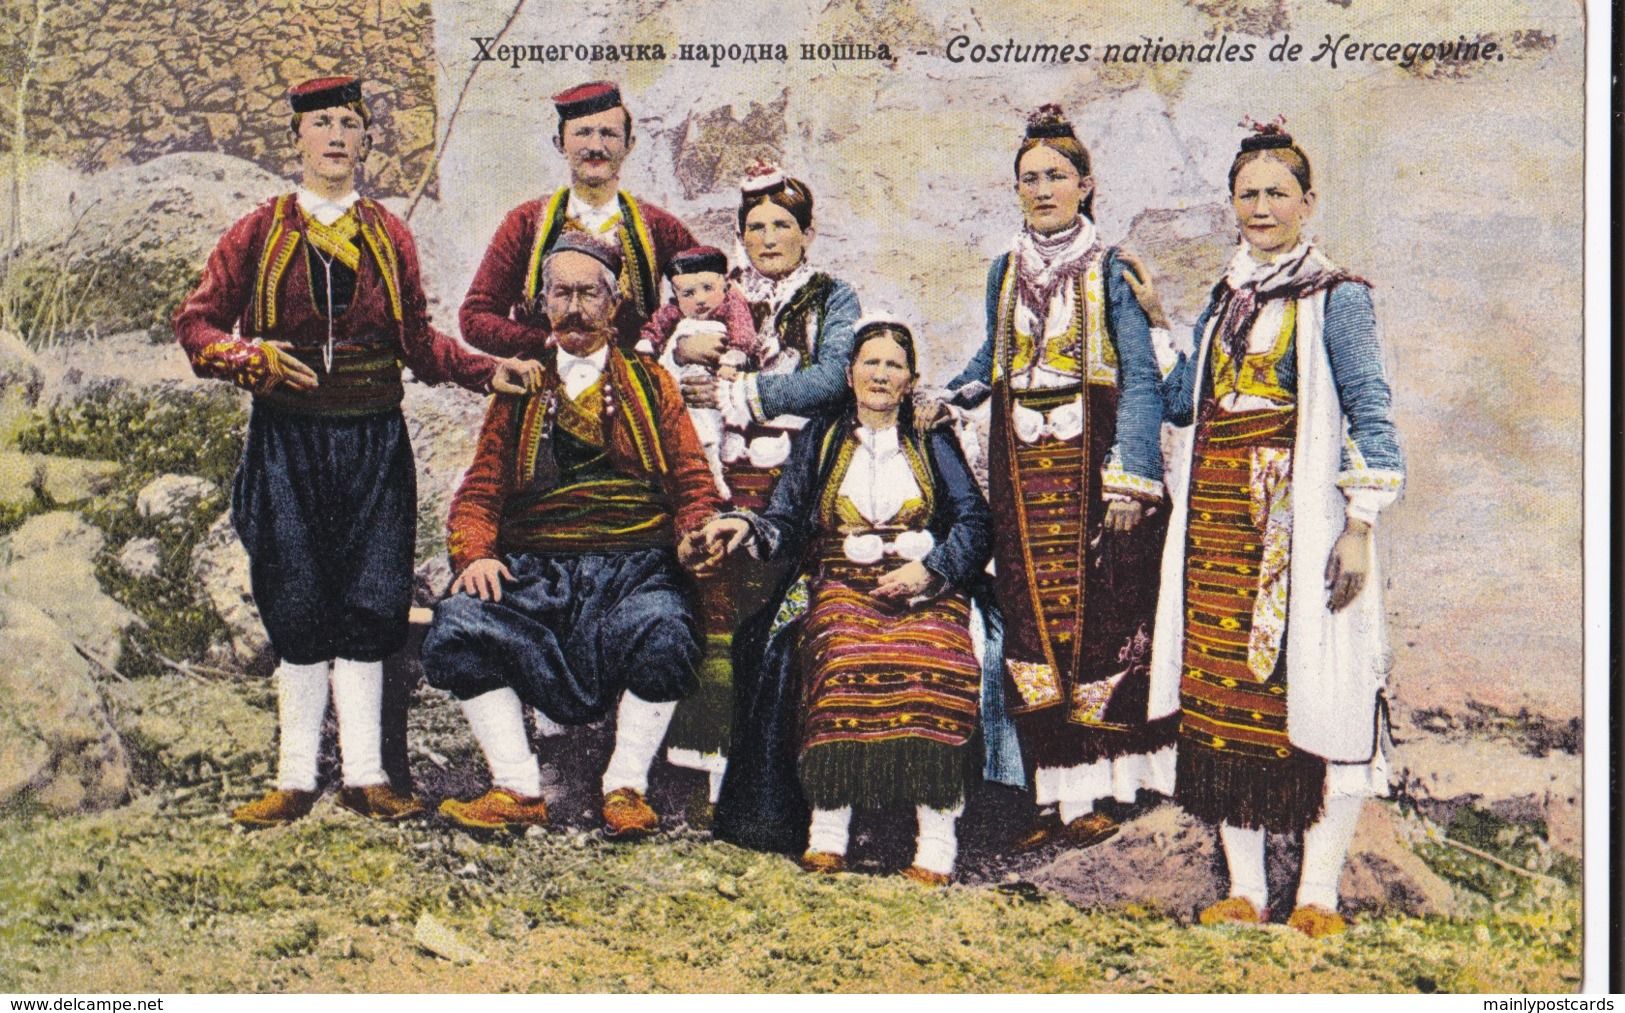 AO17 Social History Postcard - Costumes Nationales De Hercegovine - Costumes